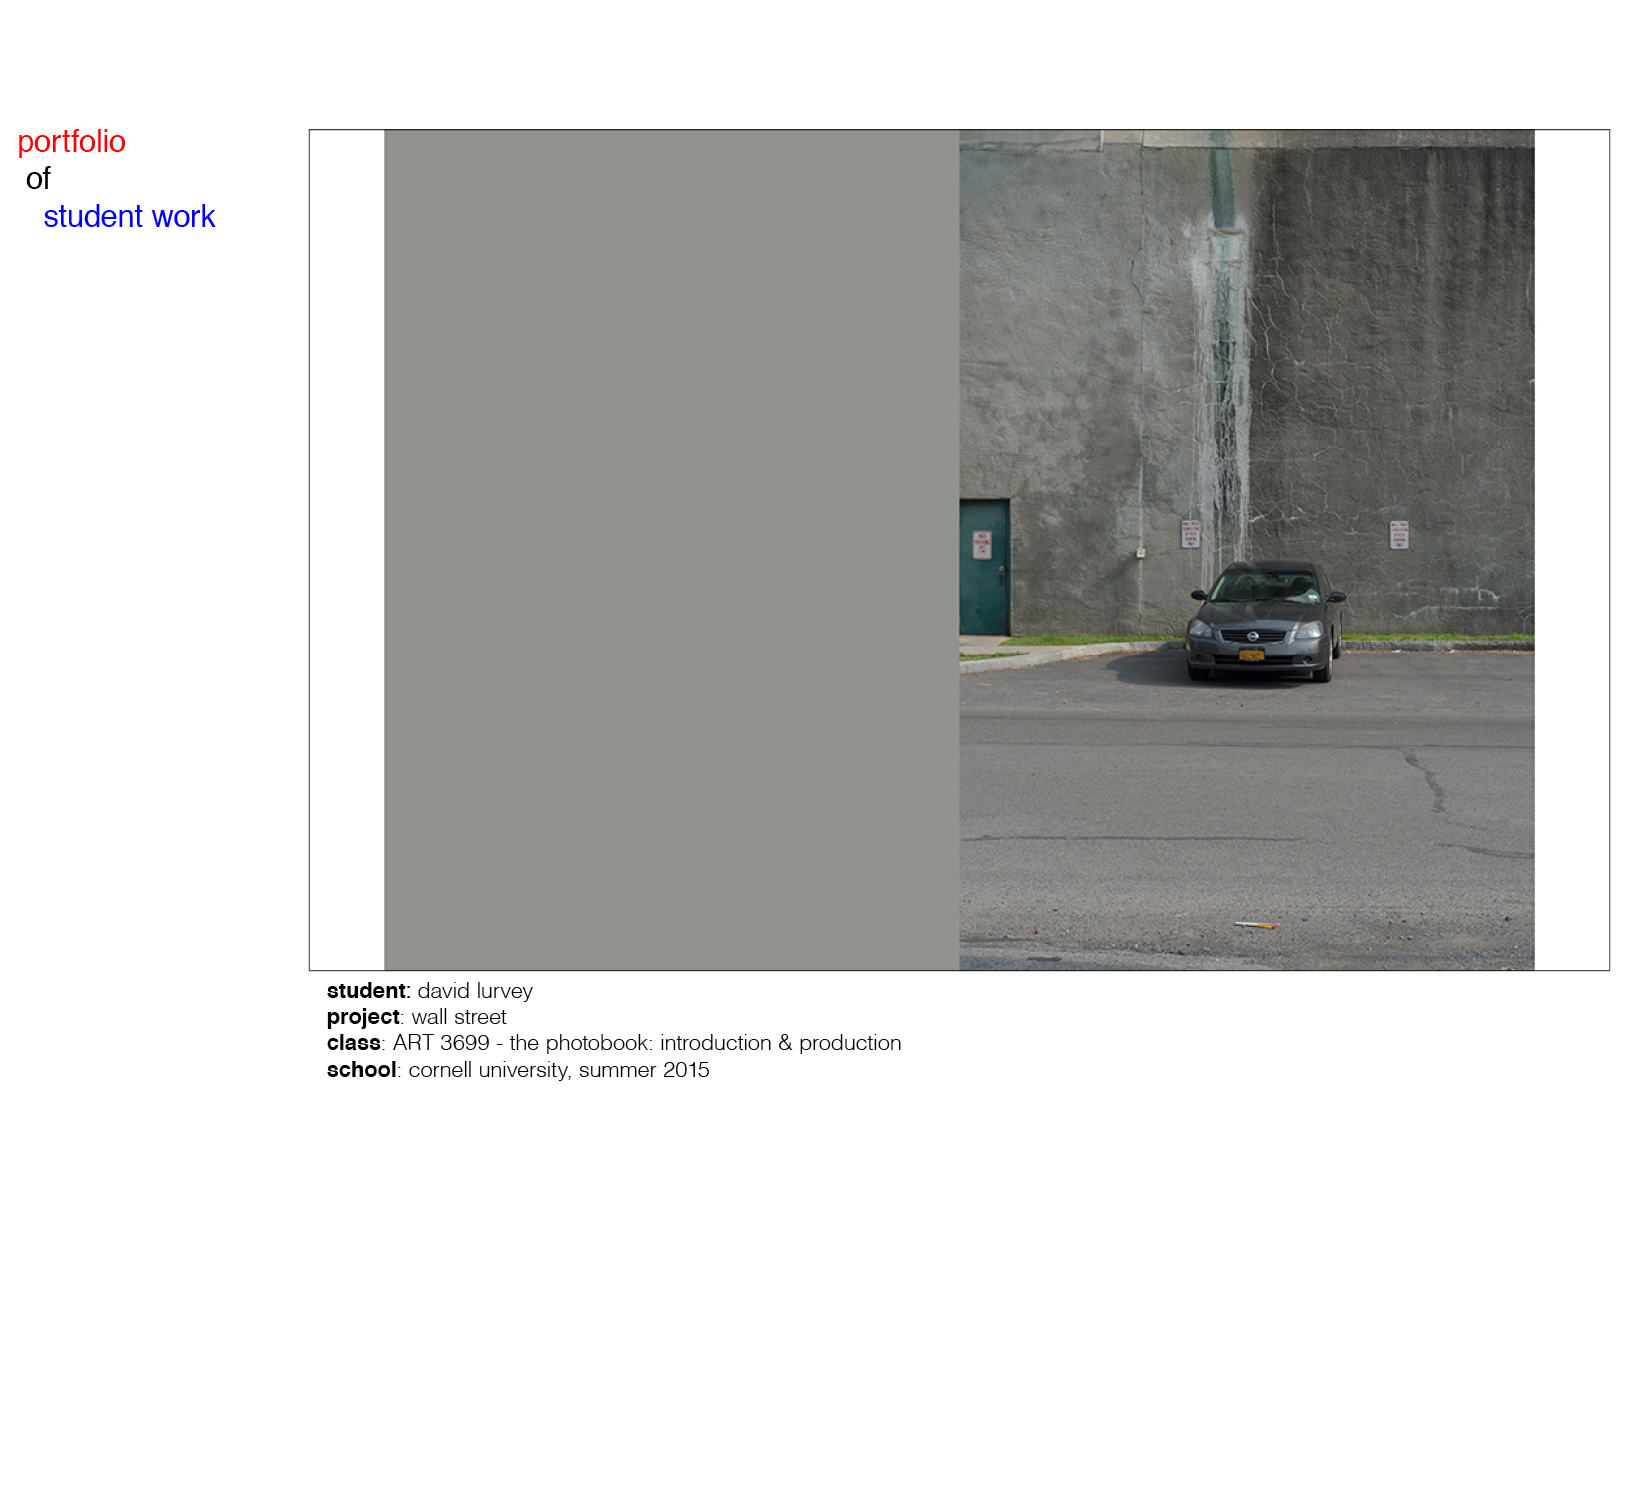 wall_street_002.jpg